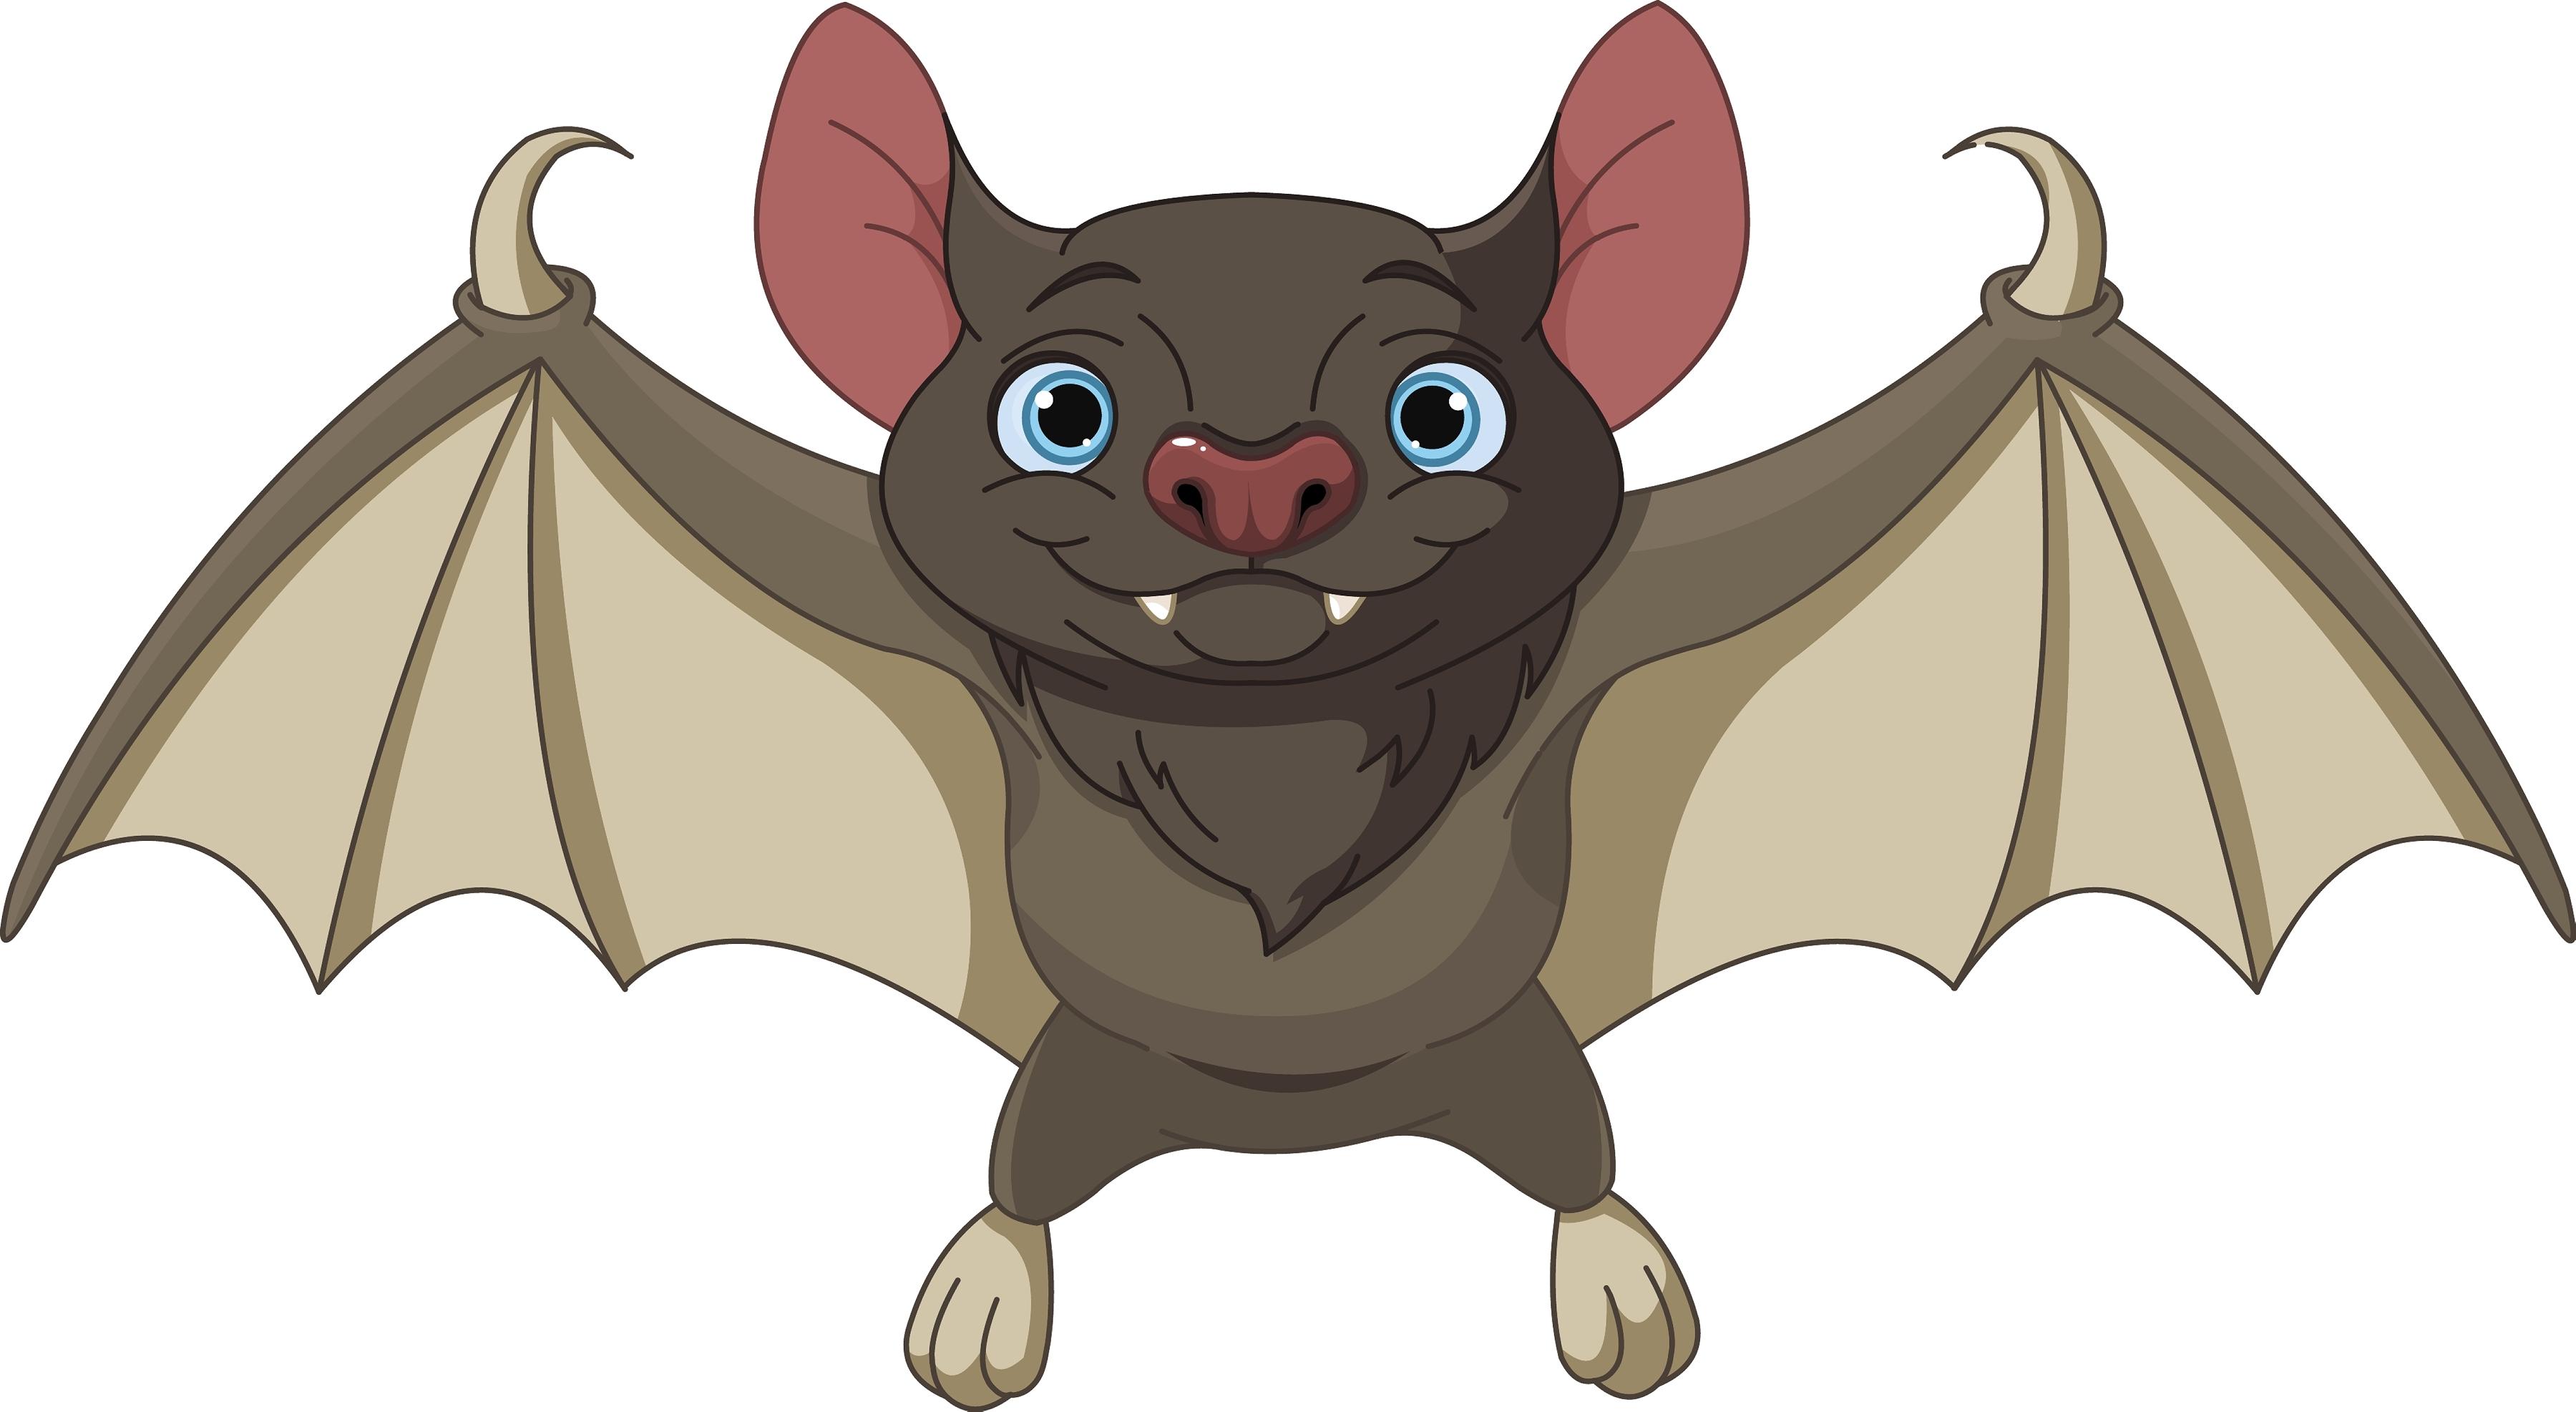 15 Bat Clipart Dracula For Free Download On Mbtskoudsalg intended for Bat  Clipart